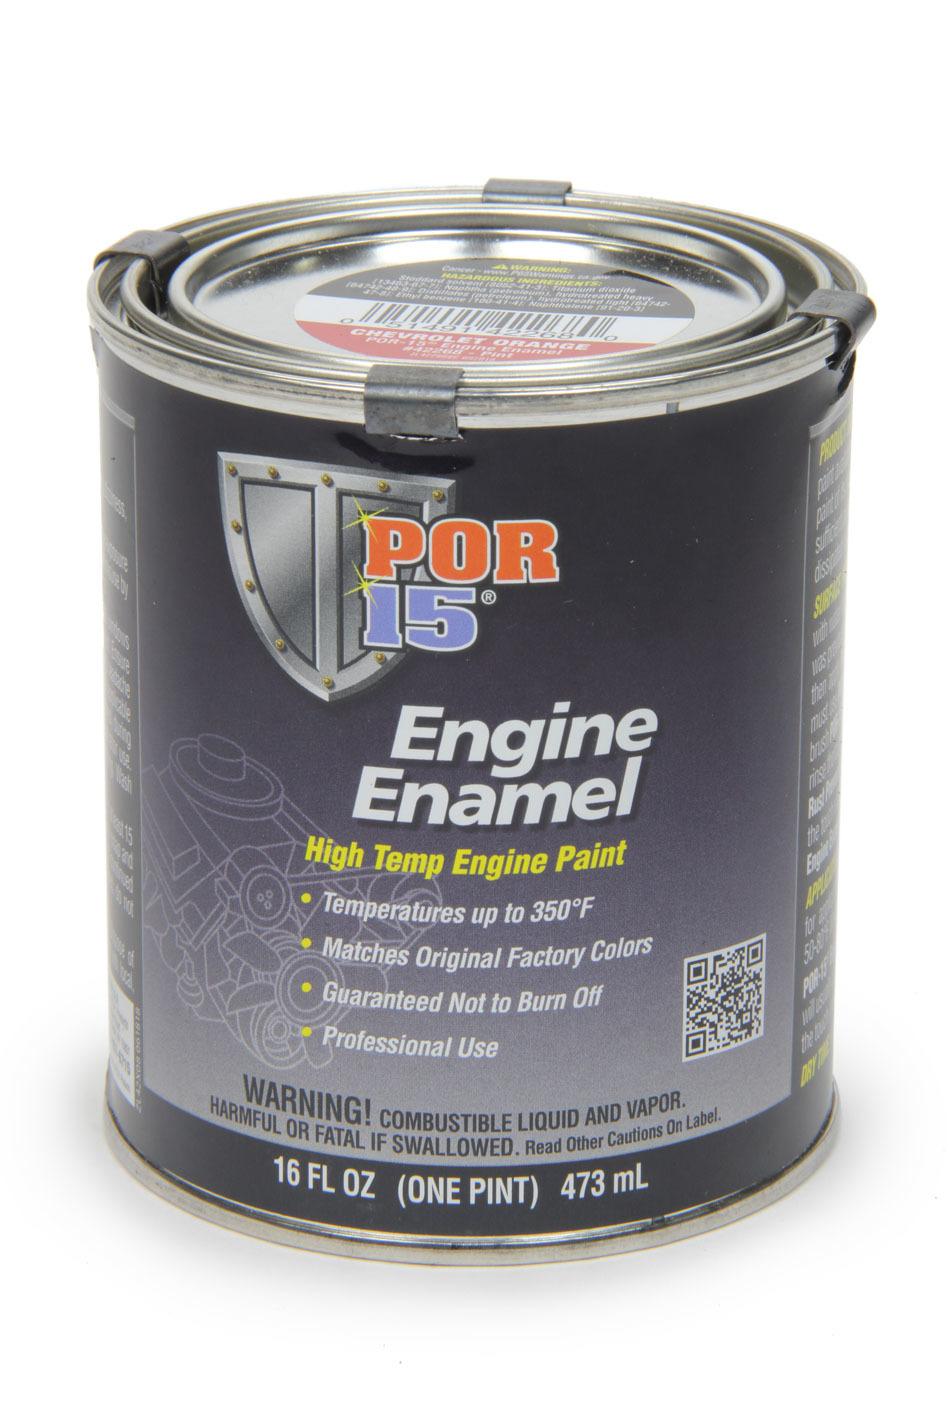 Engine Enamel Chevy Oran ge  Pint